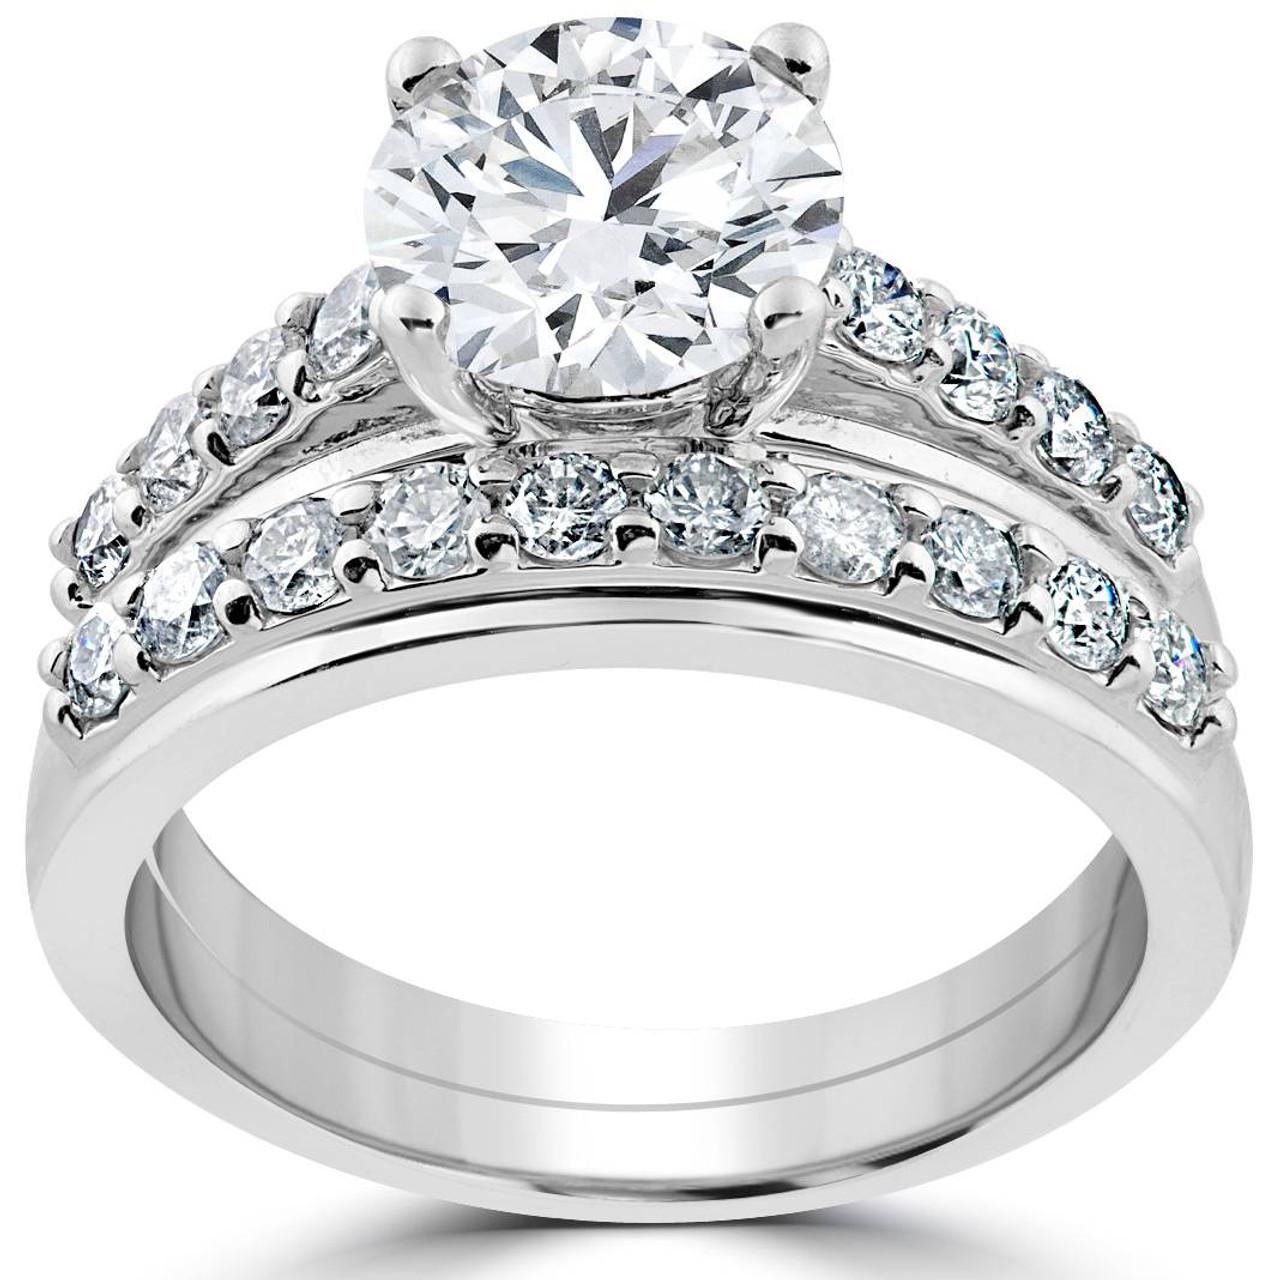 3ct Diamond Engagement Wedding Ring Set 14k White Gold